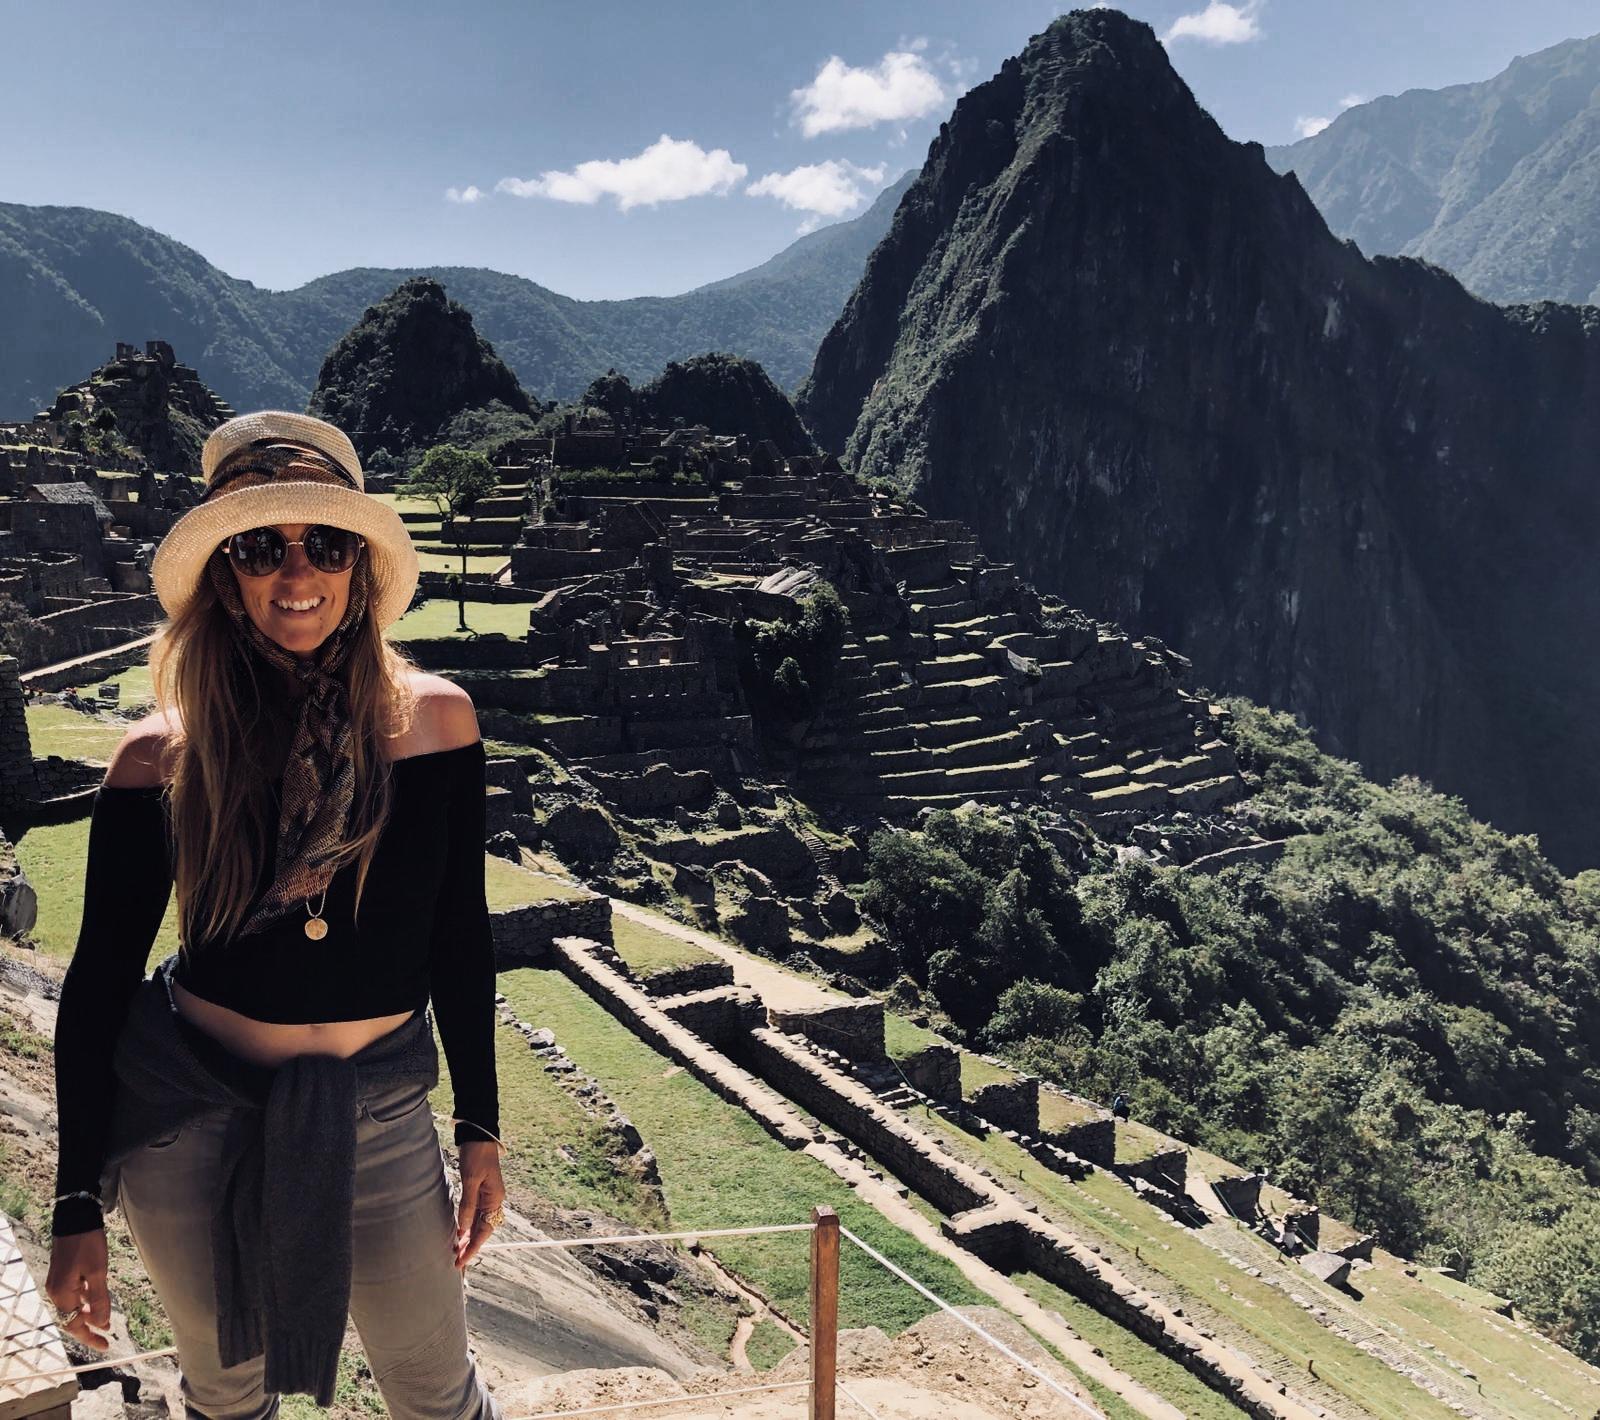 adventure & sun protection with Greenpacha